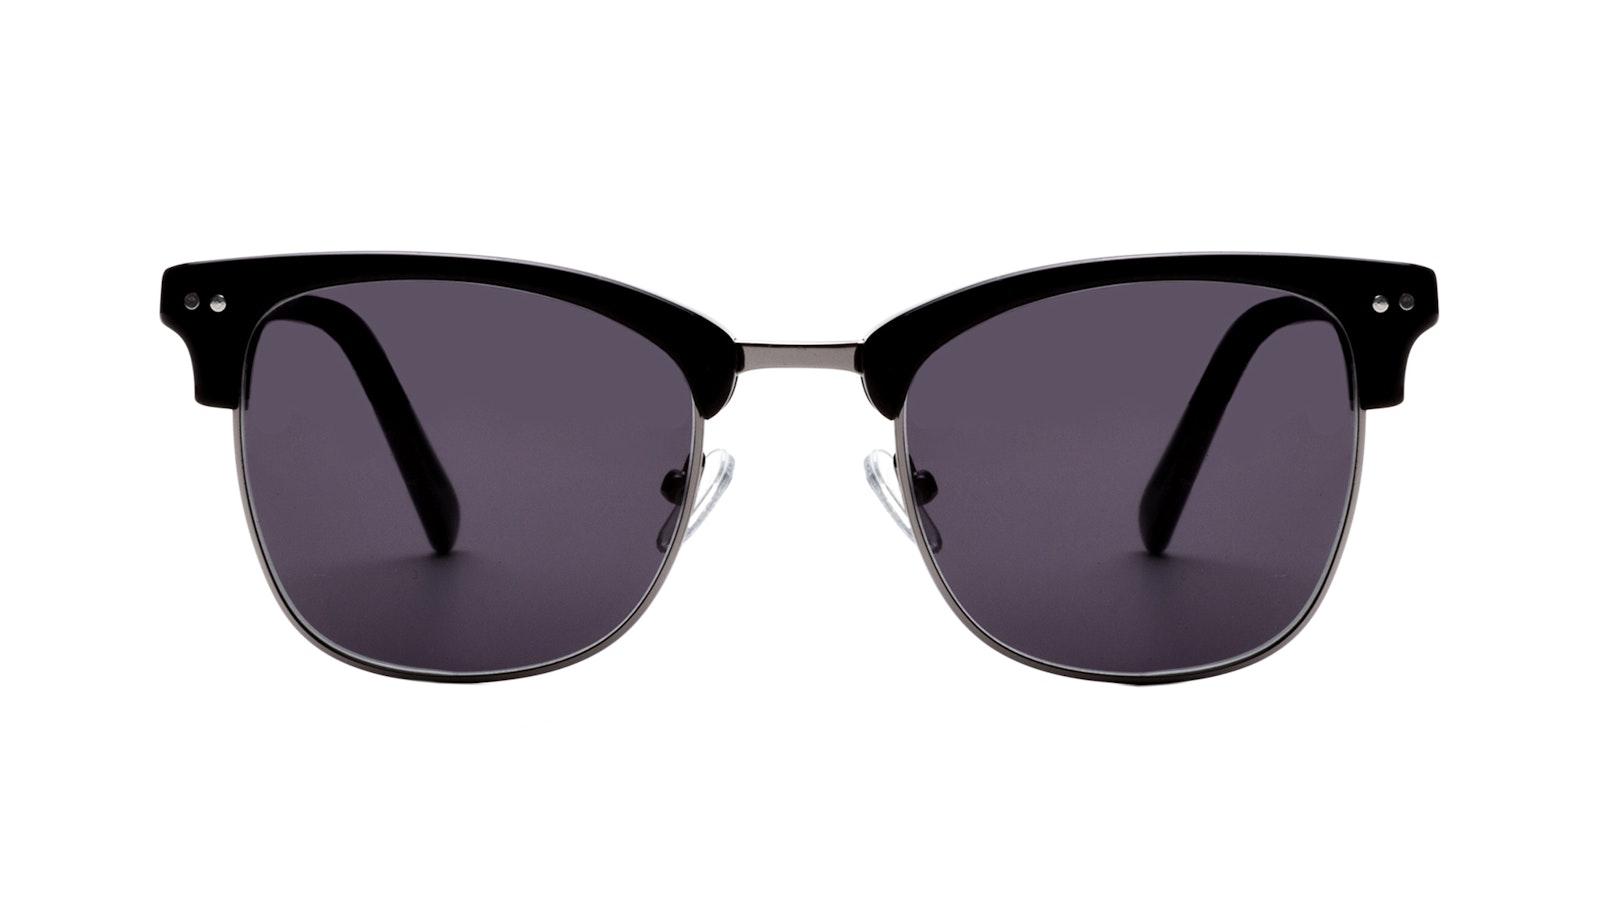 Affordable Fashion Glasses Square Sunglasses Men Lift Onyx